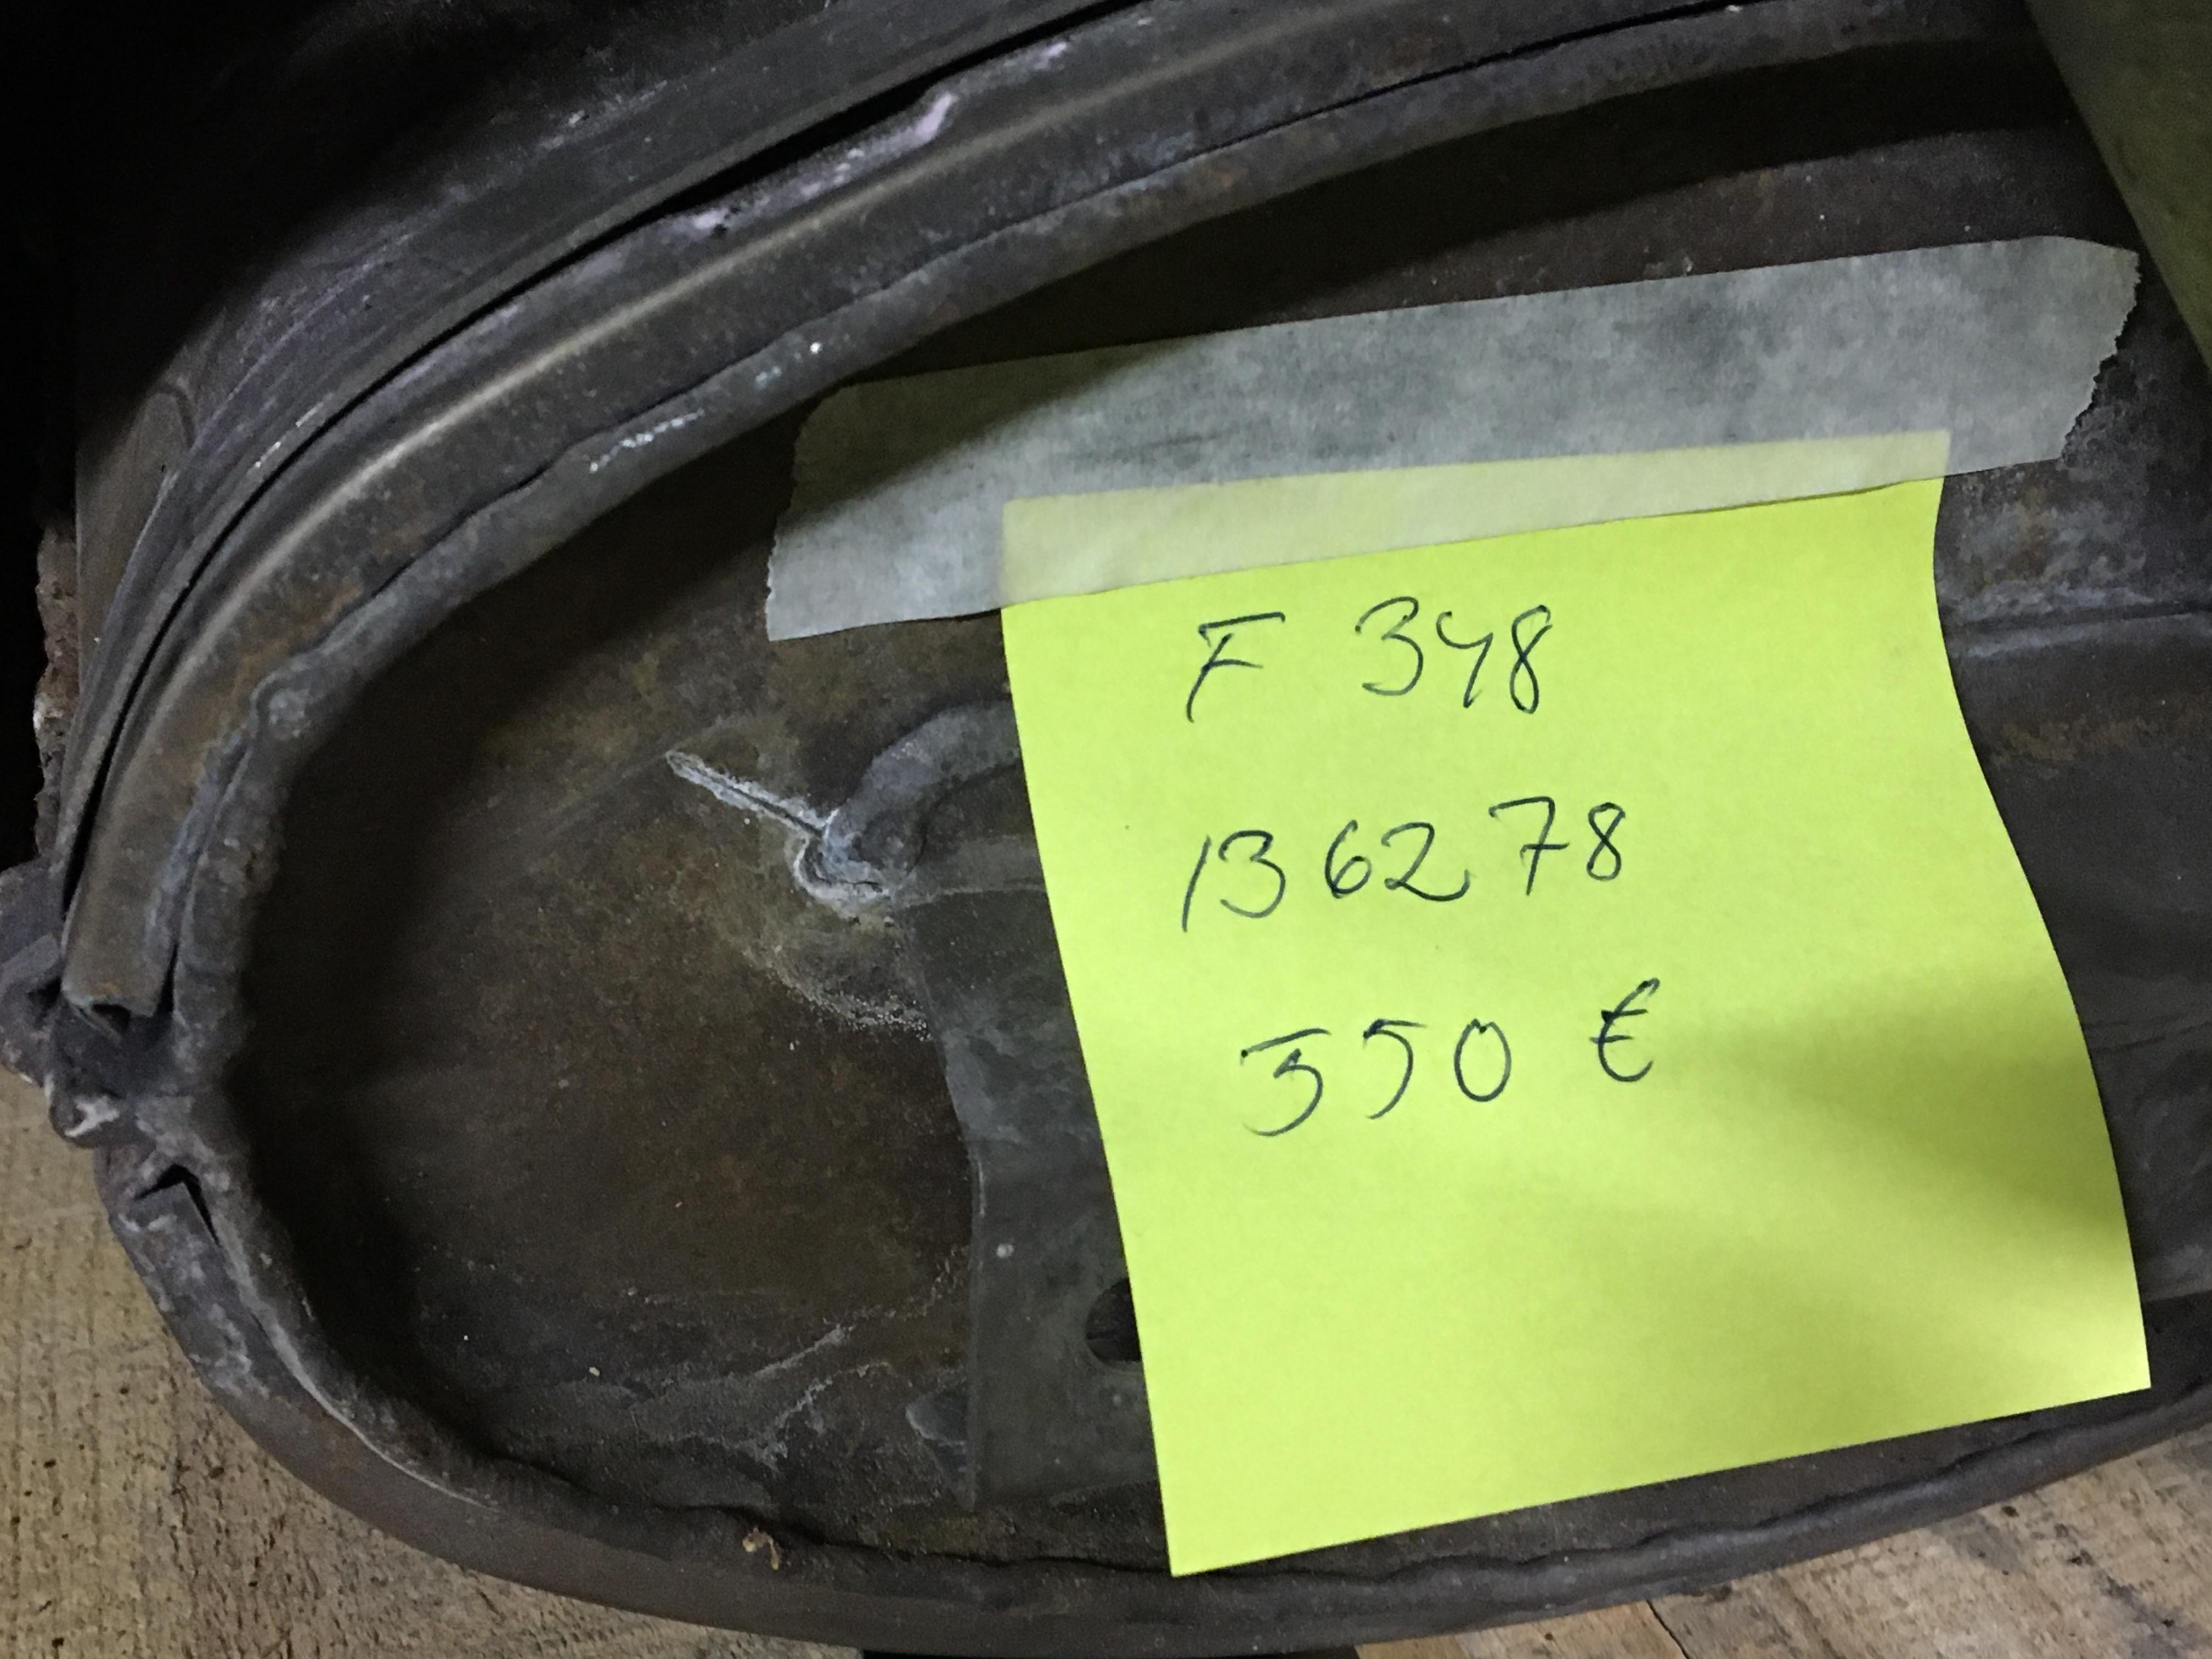 Exhaust Muffler F348 tb/ts